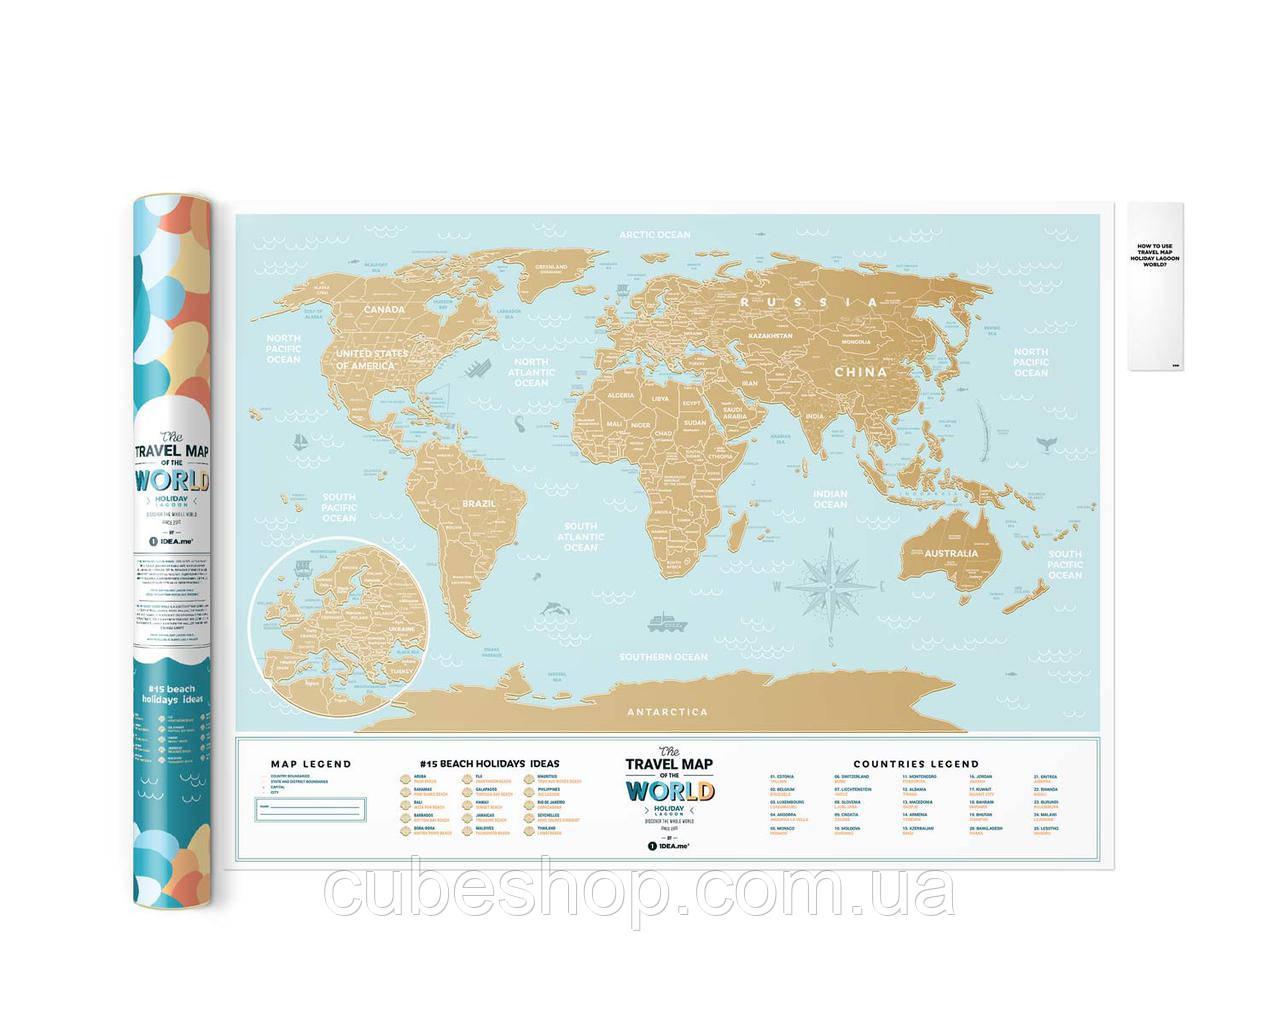 Скретч карта мира Travel Map Holiday Lagoon World (английский язык) в тубусе